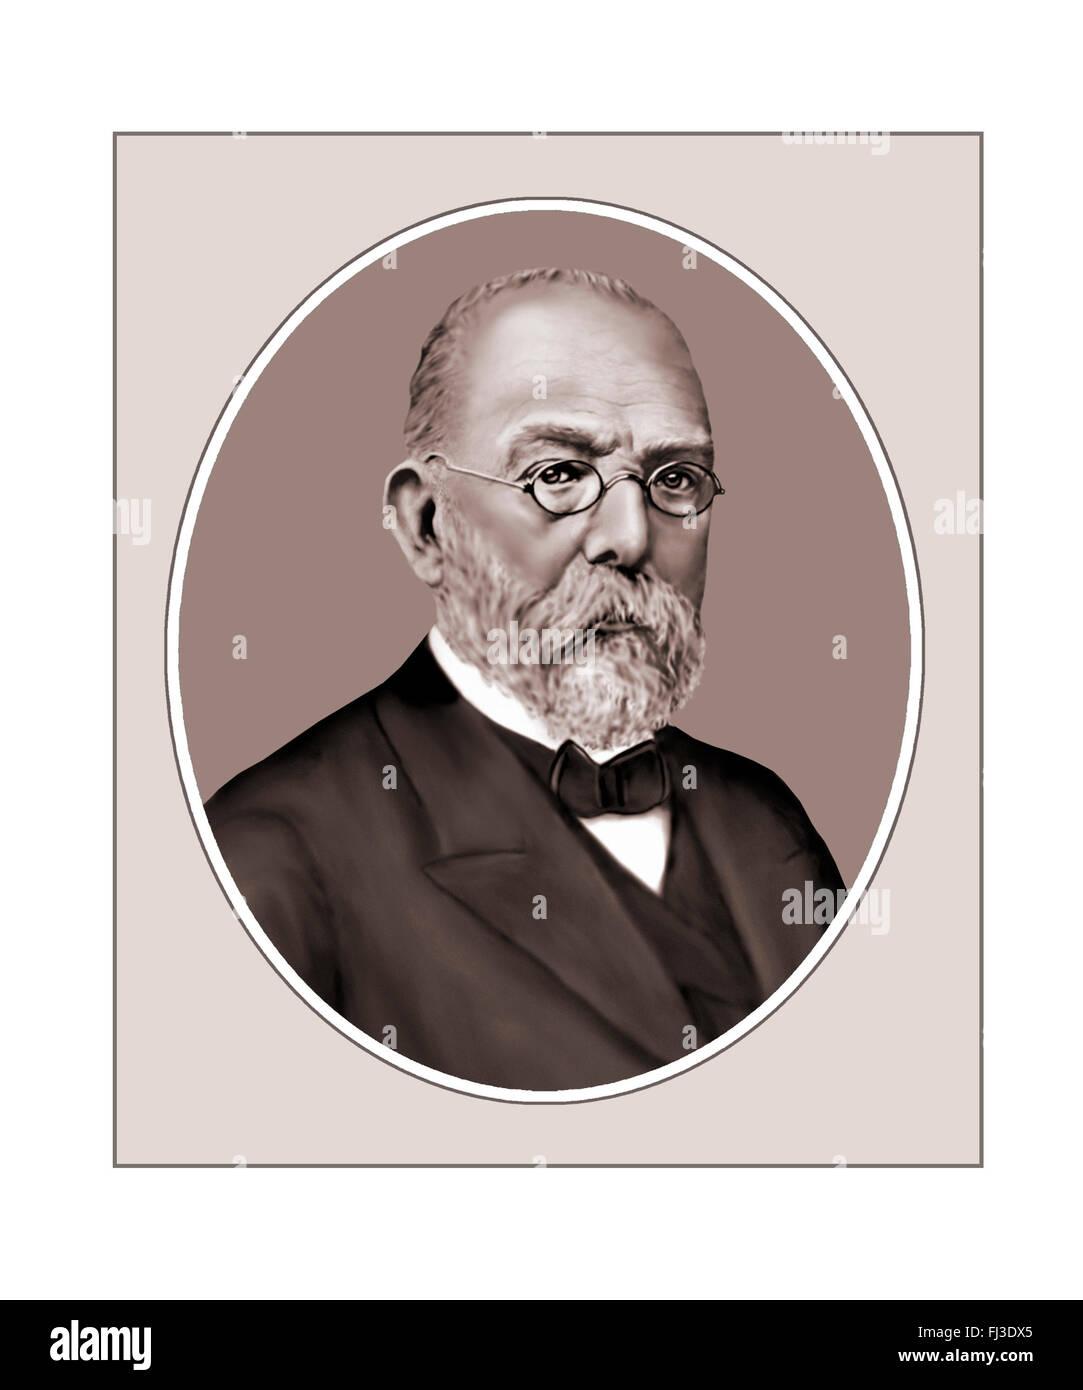 Robert Koch, Bacteriologist, Portrait - Stock Image